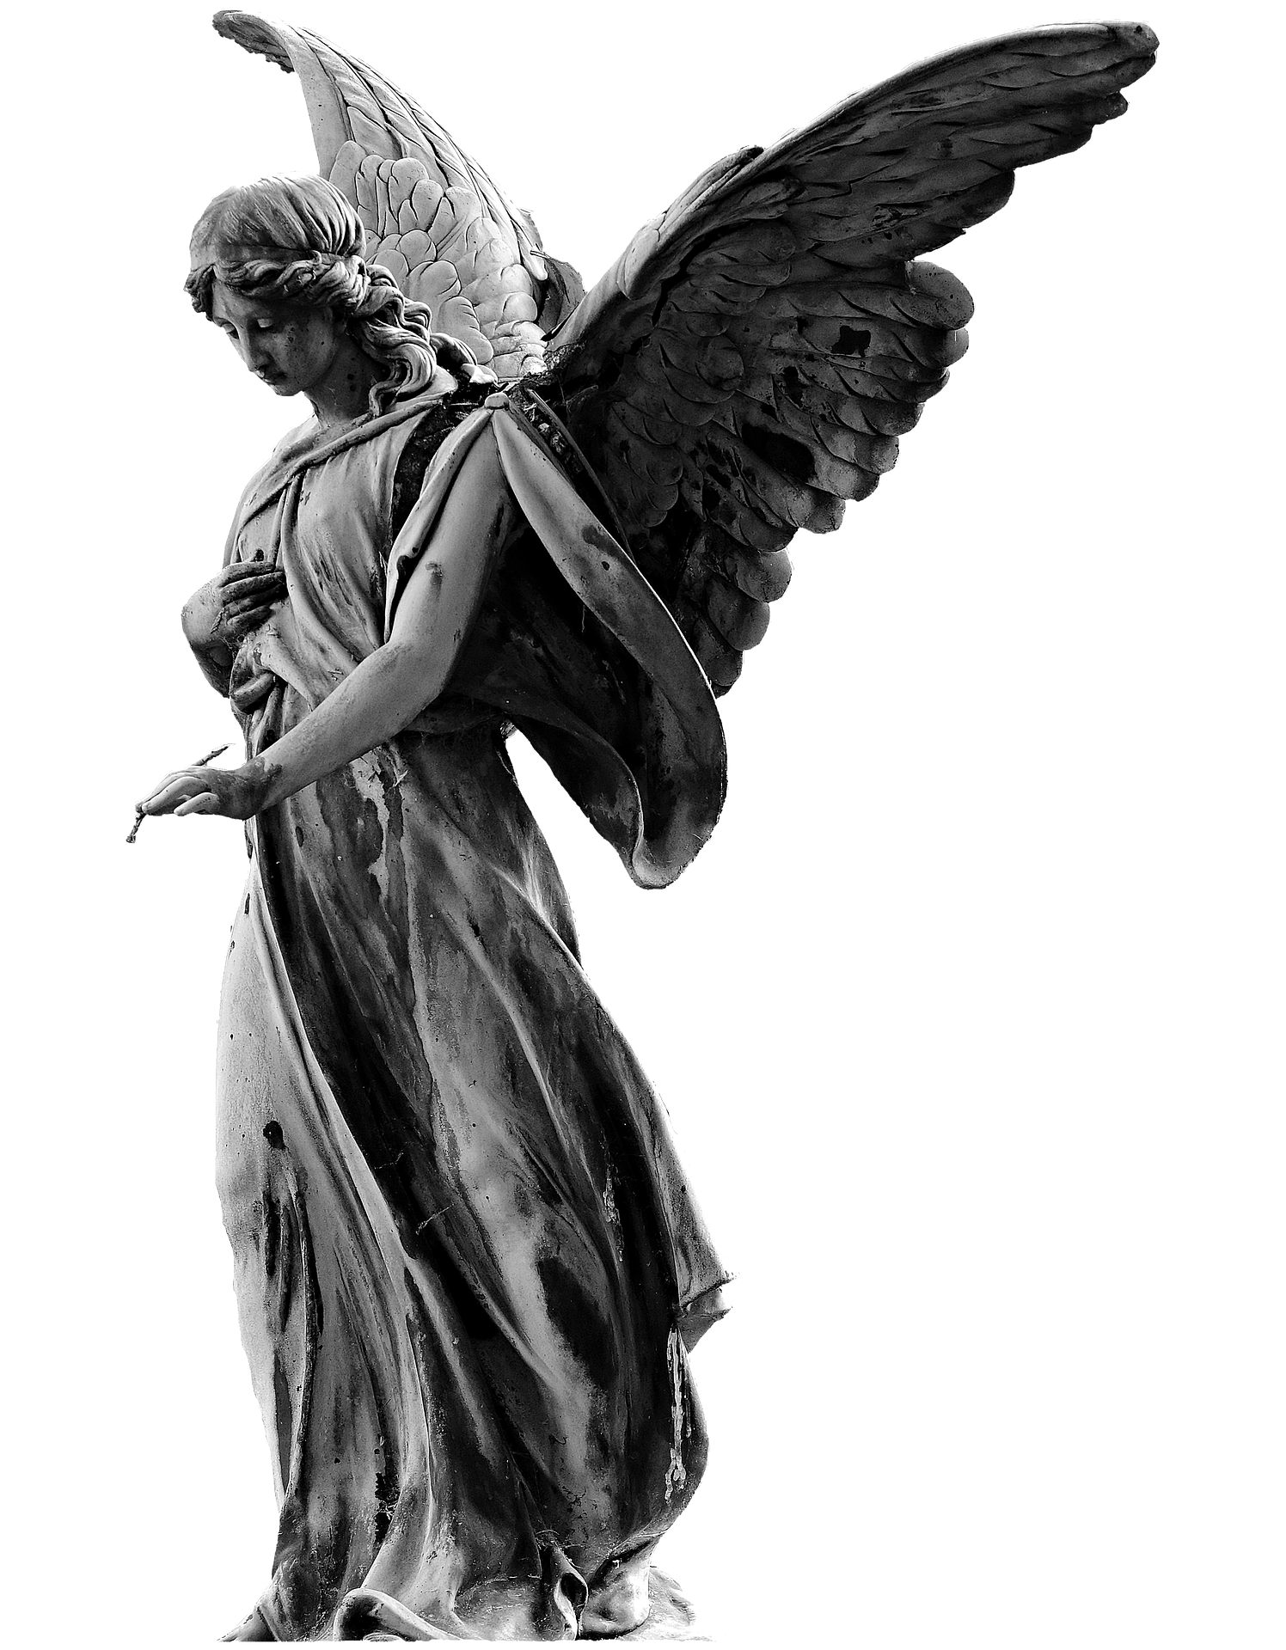 angel 2636961 1920 1